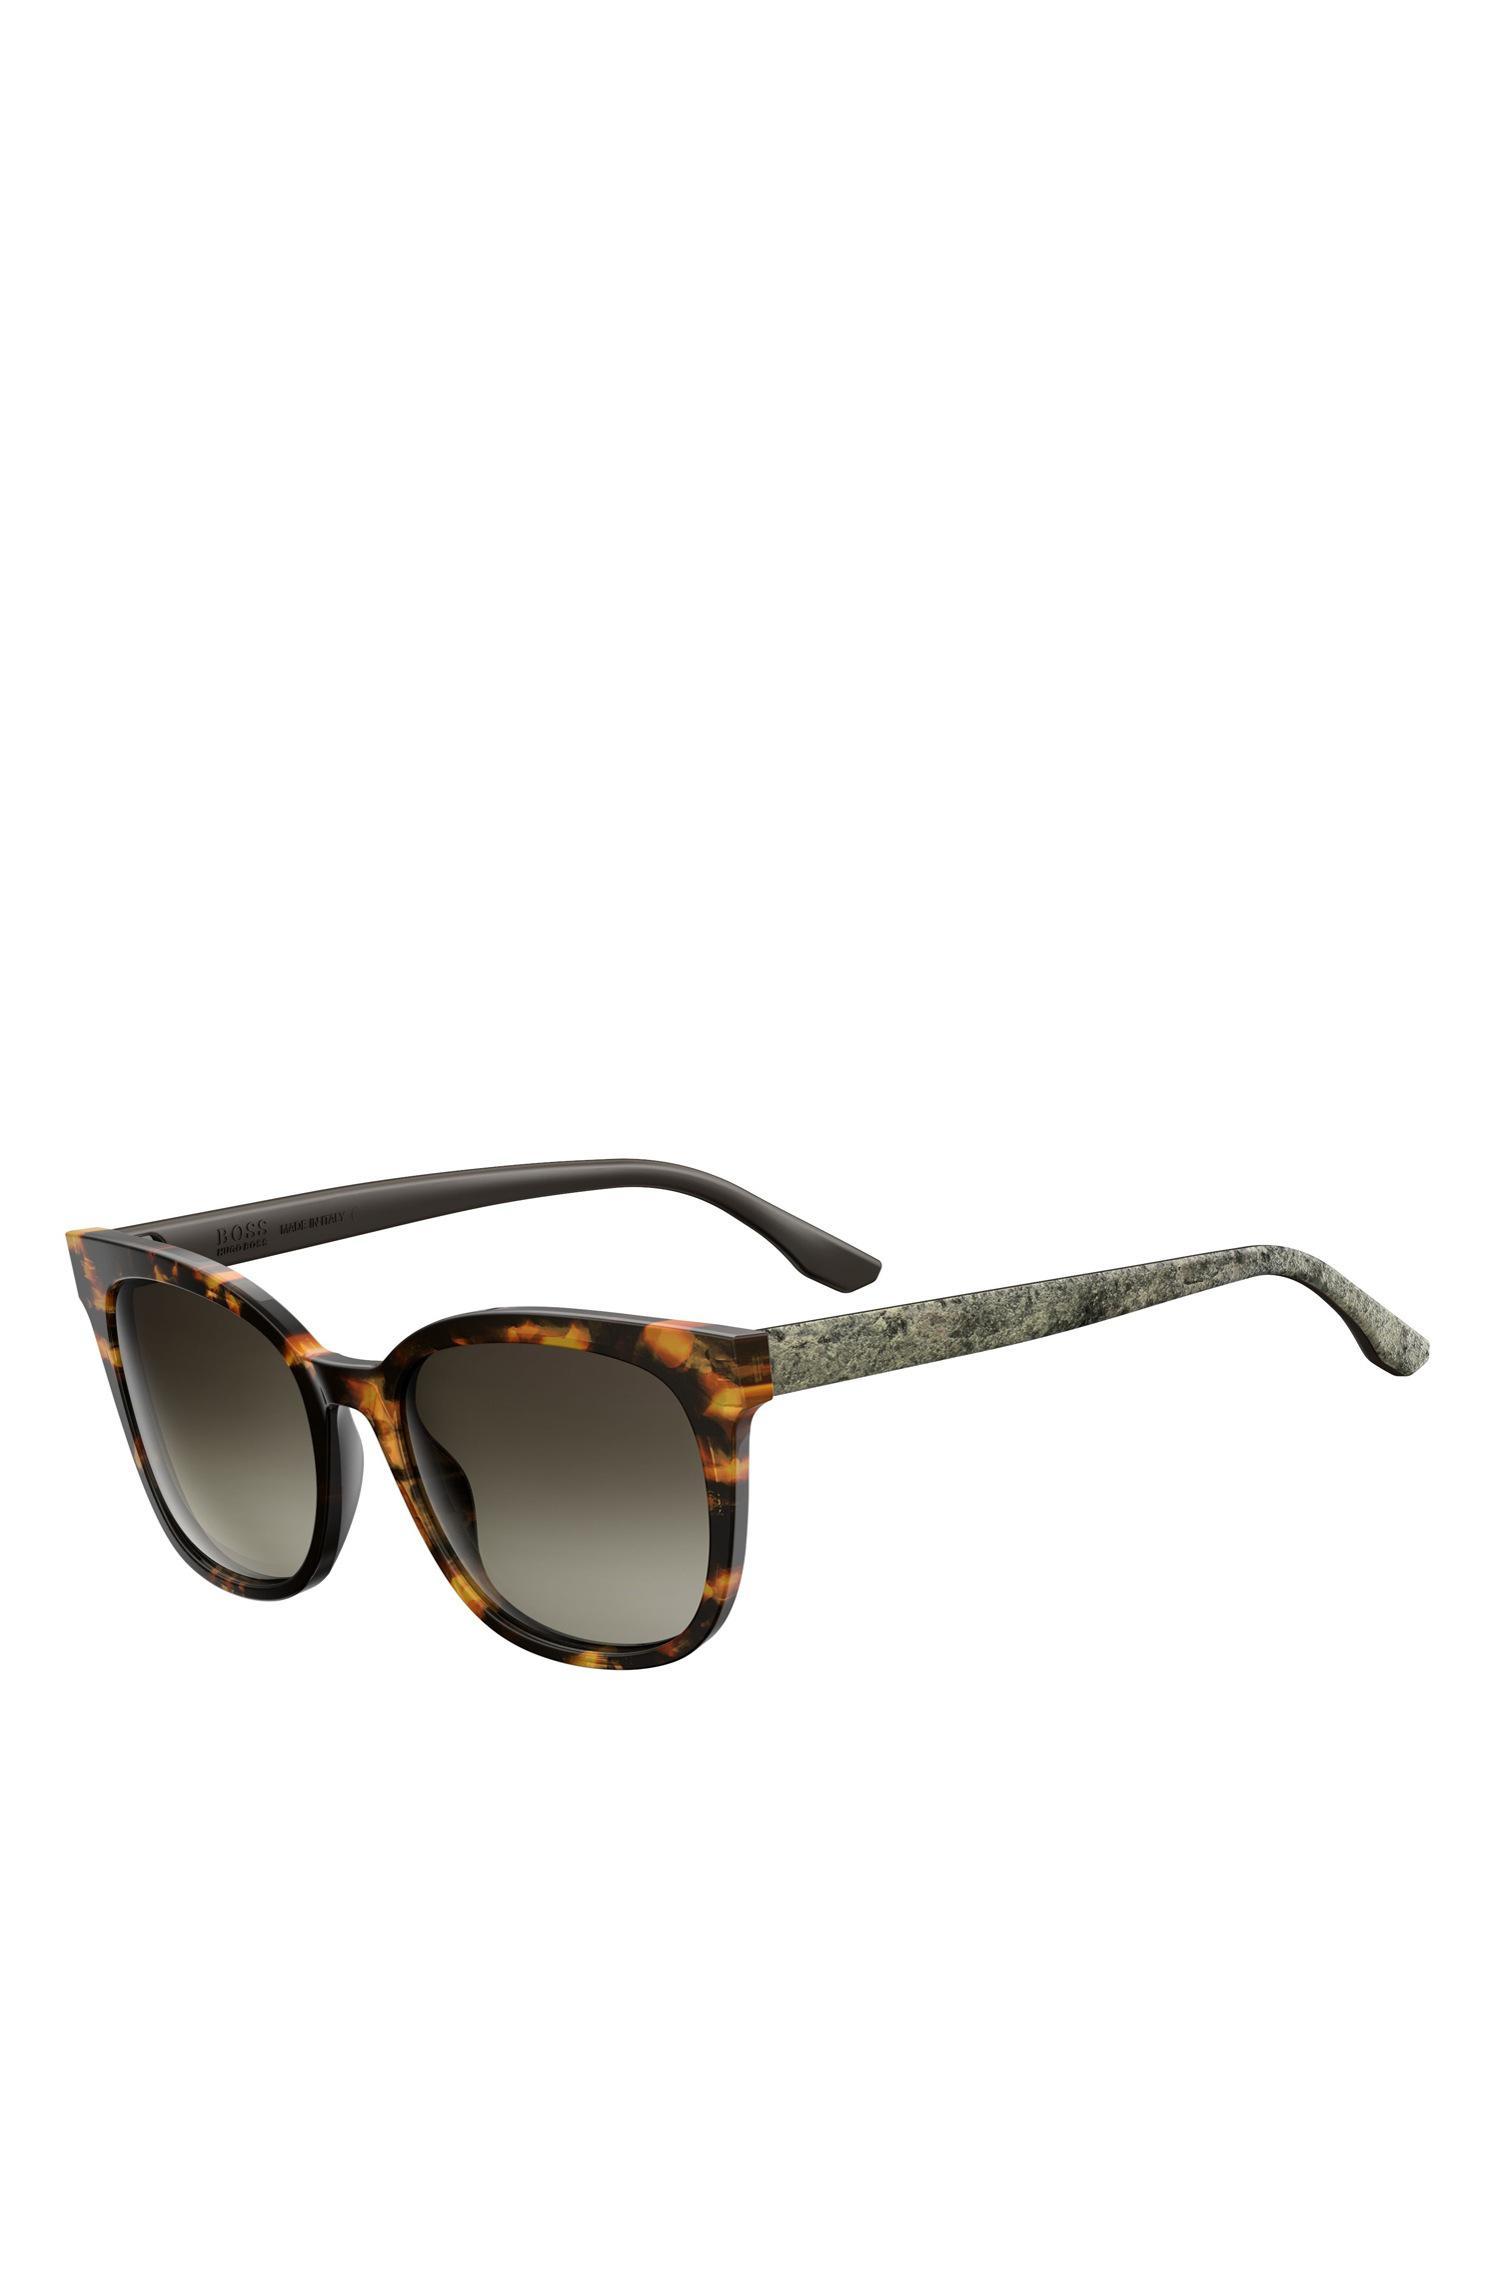 e8cc26647e BOSS. Women s Brown Tortoiseshell Acetate Round Sunglasses ...